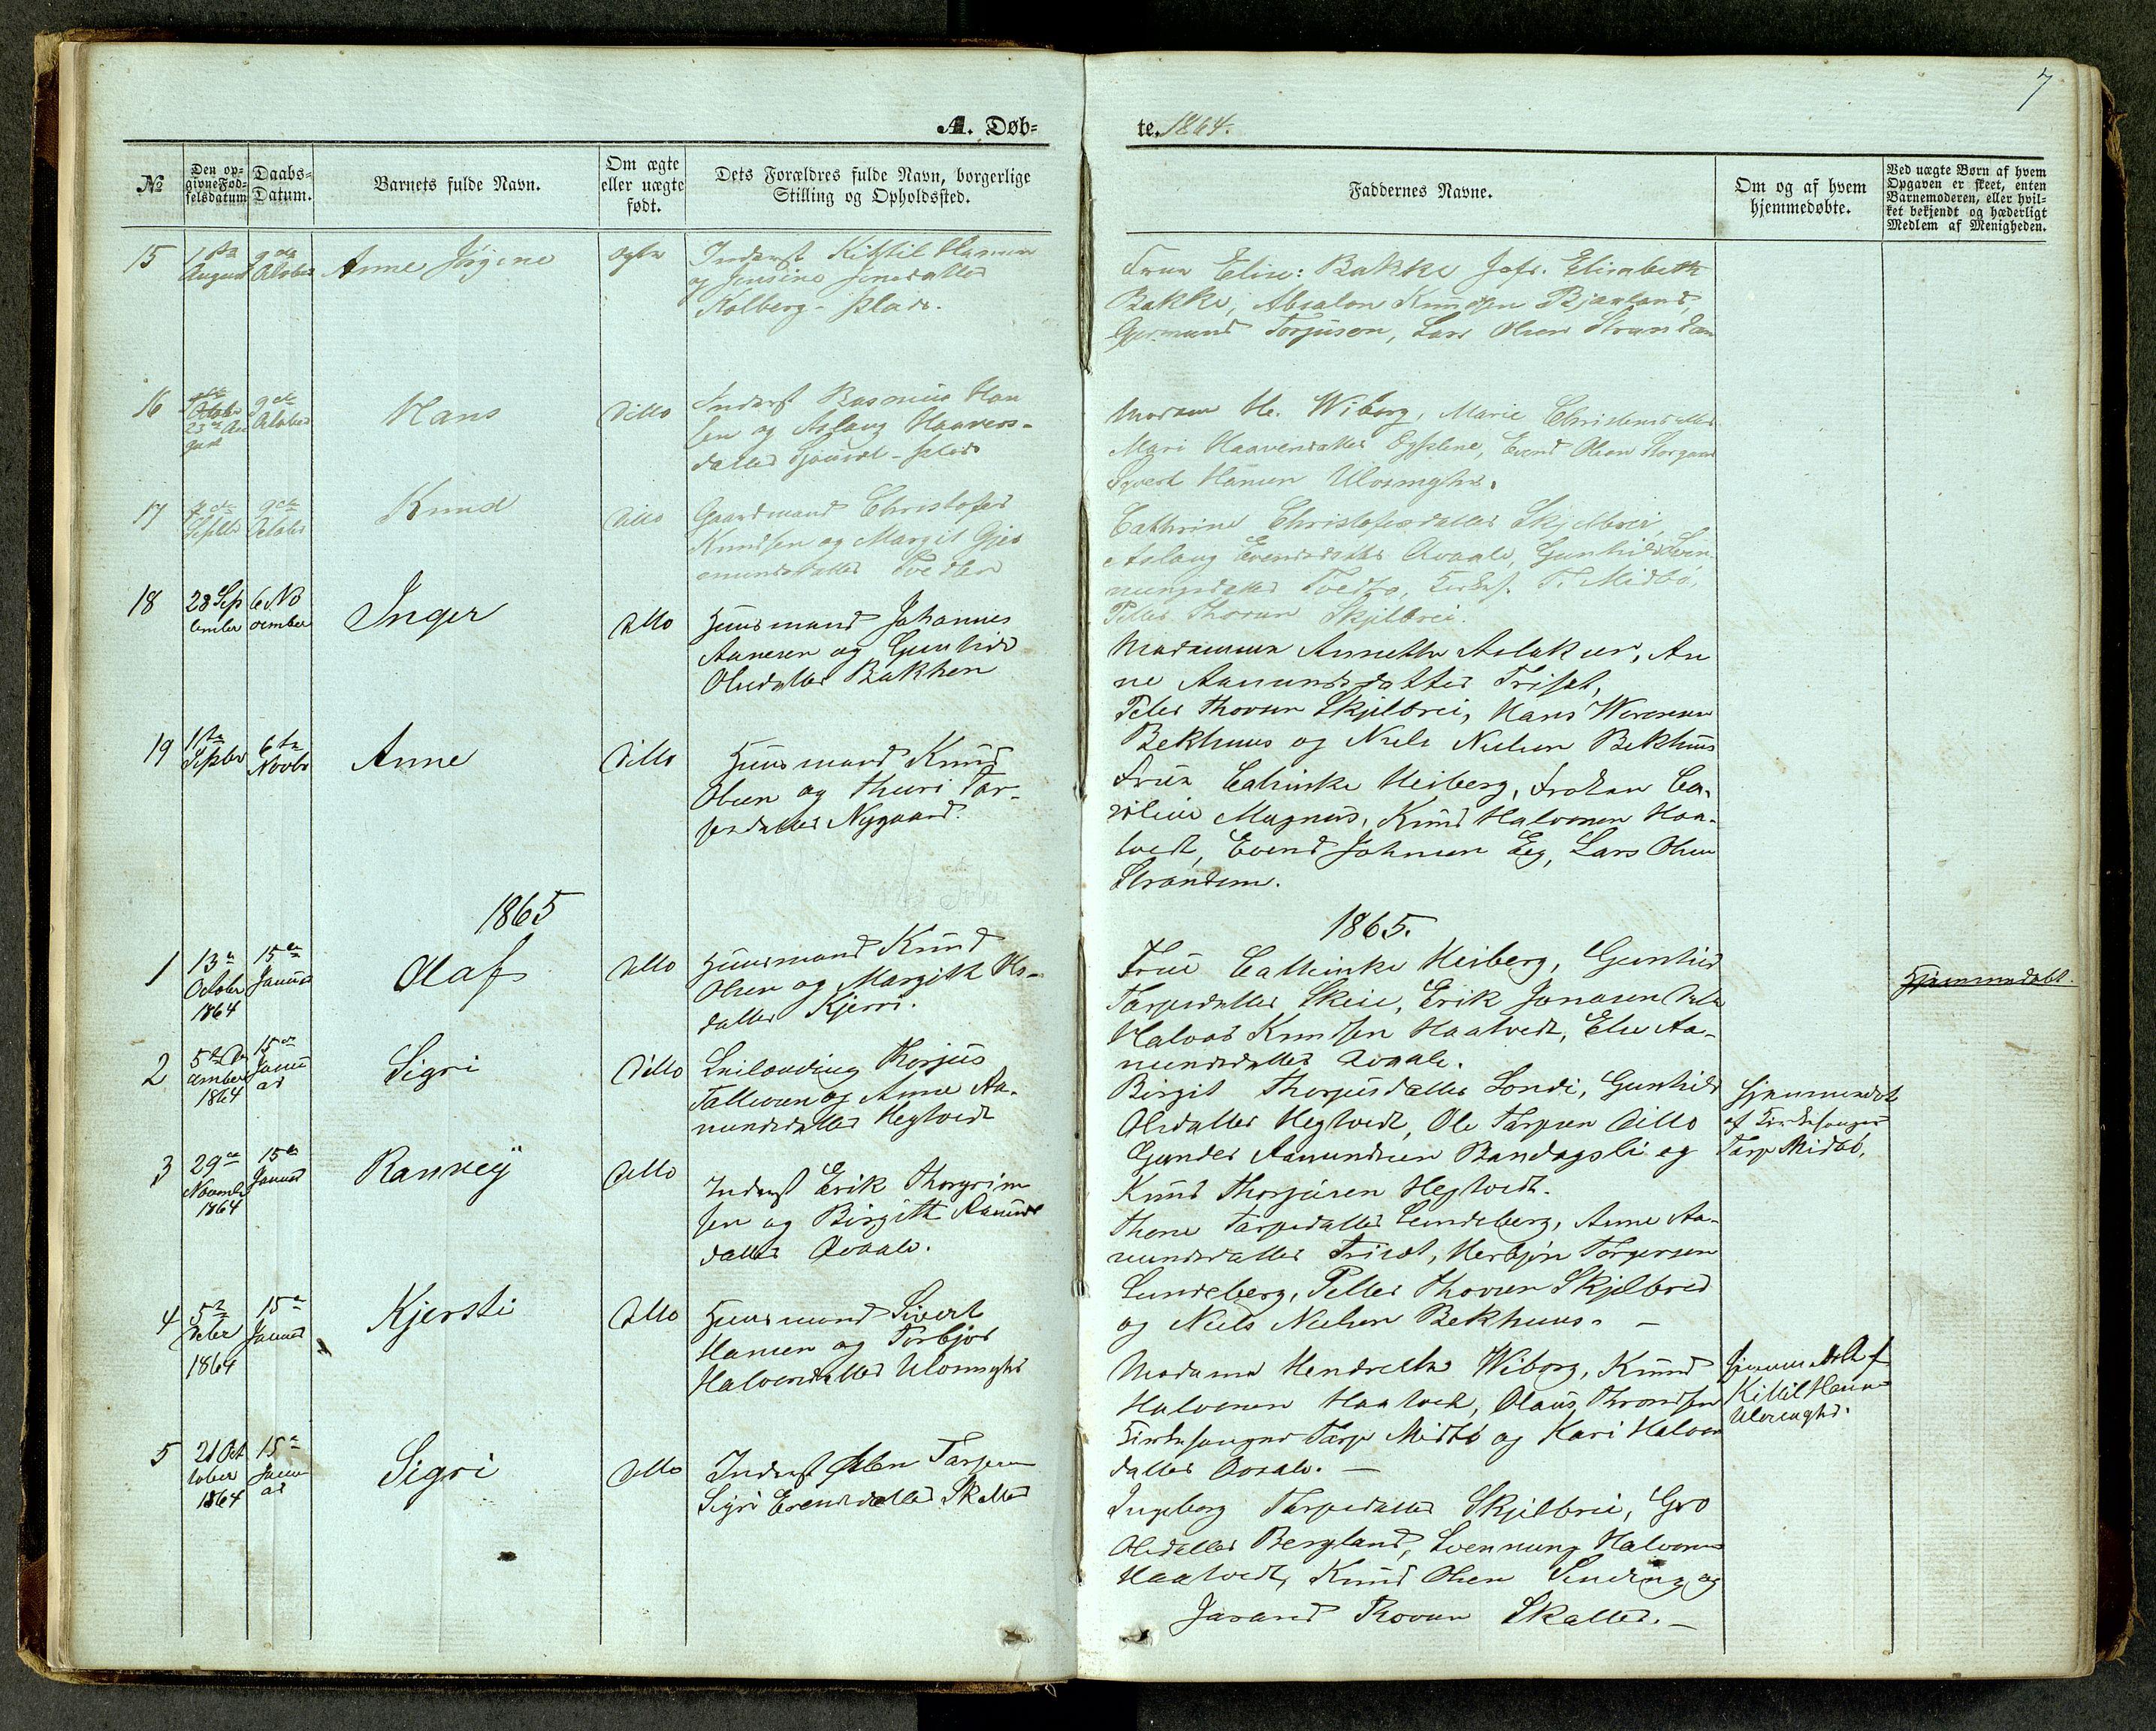 SAKO, Lårdal kirkebøker, G/Ga/L0002: Klokkerbok nr. I 2, 1861-1890, s. 7